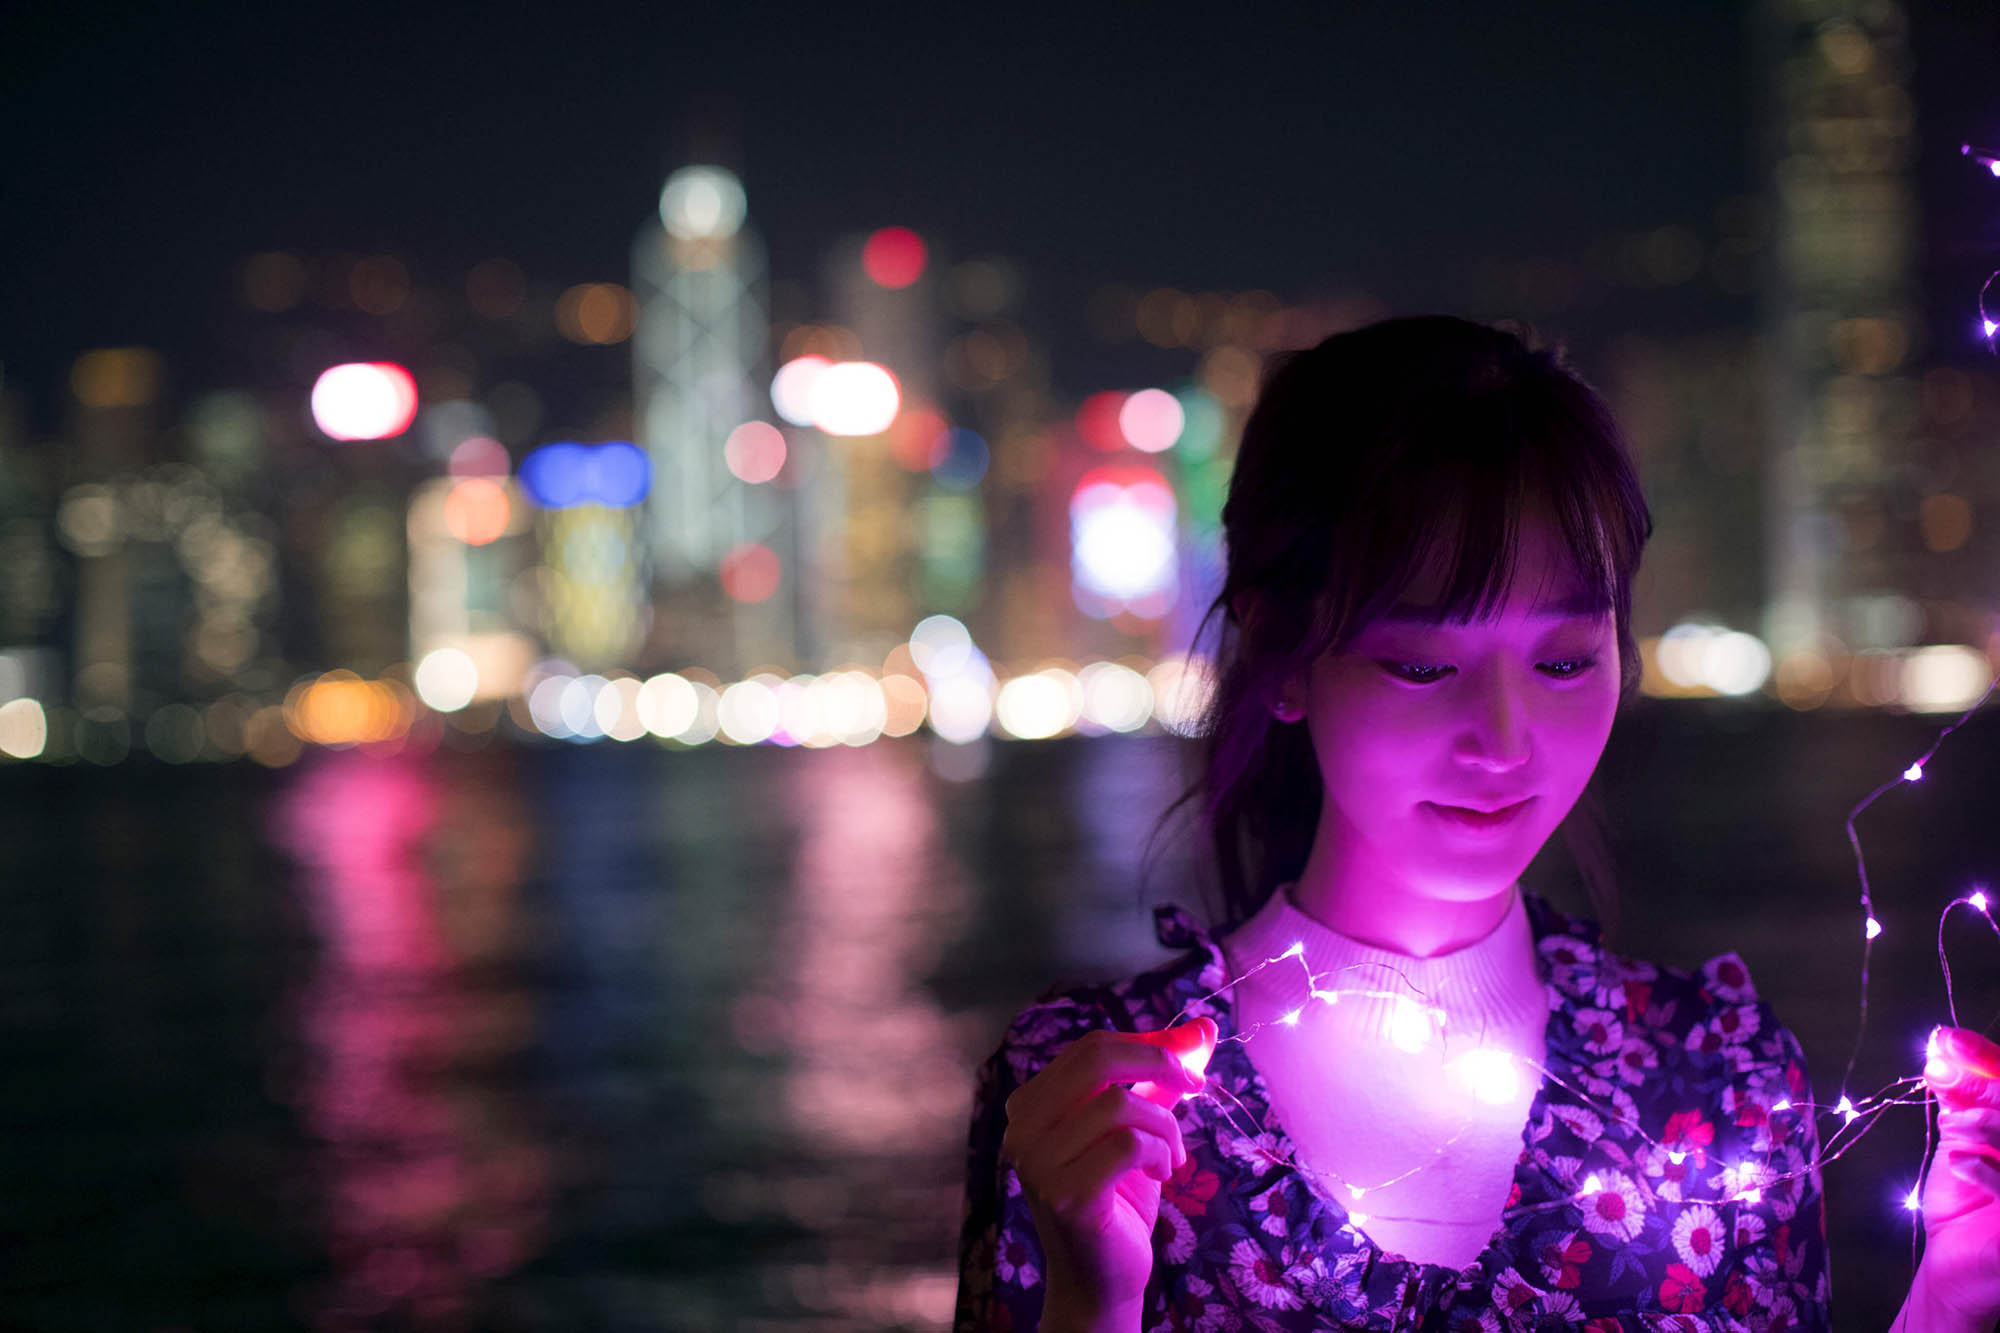 Sprazzi_Professional_Portrait_Photo_Hongkong_Kevin_Resize_12.jpg